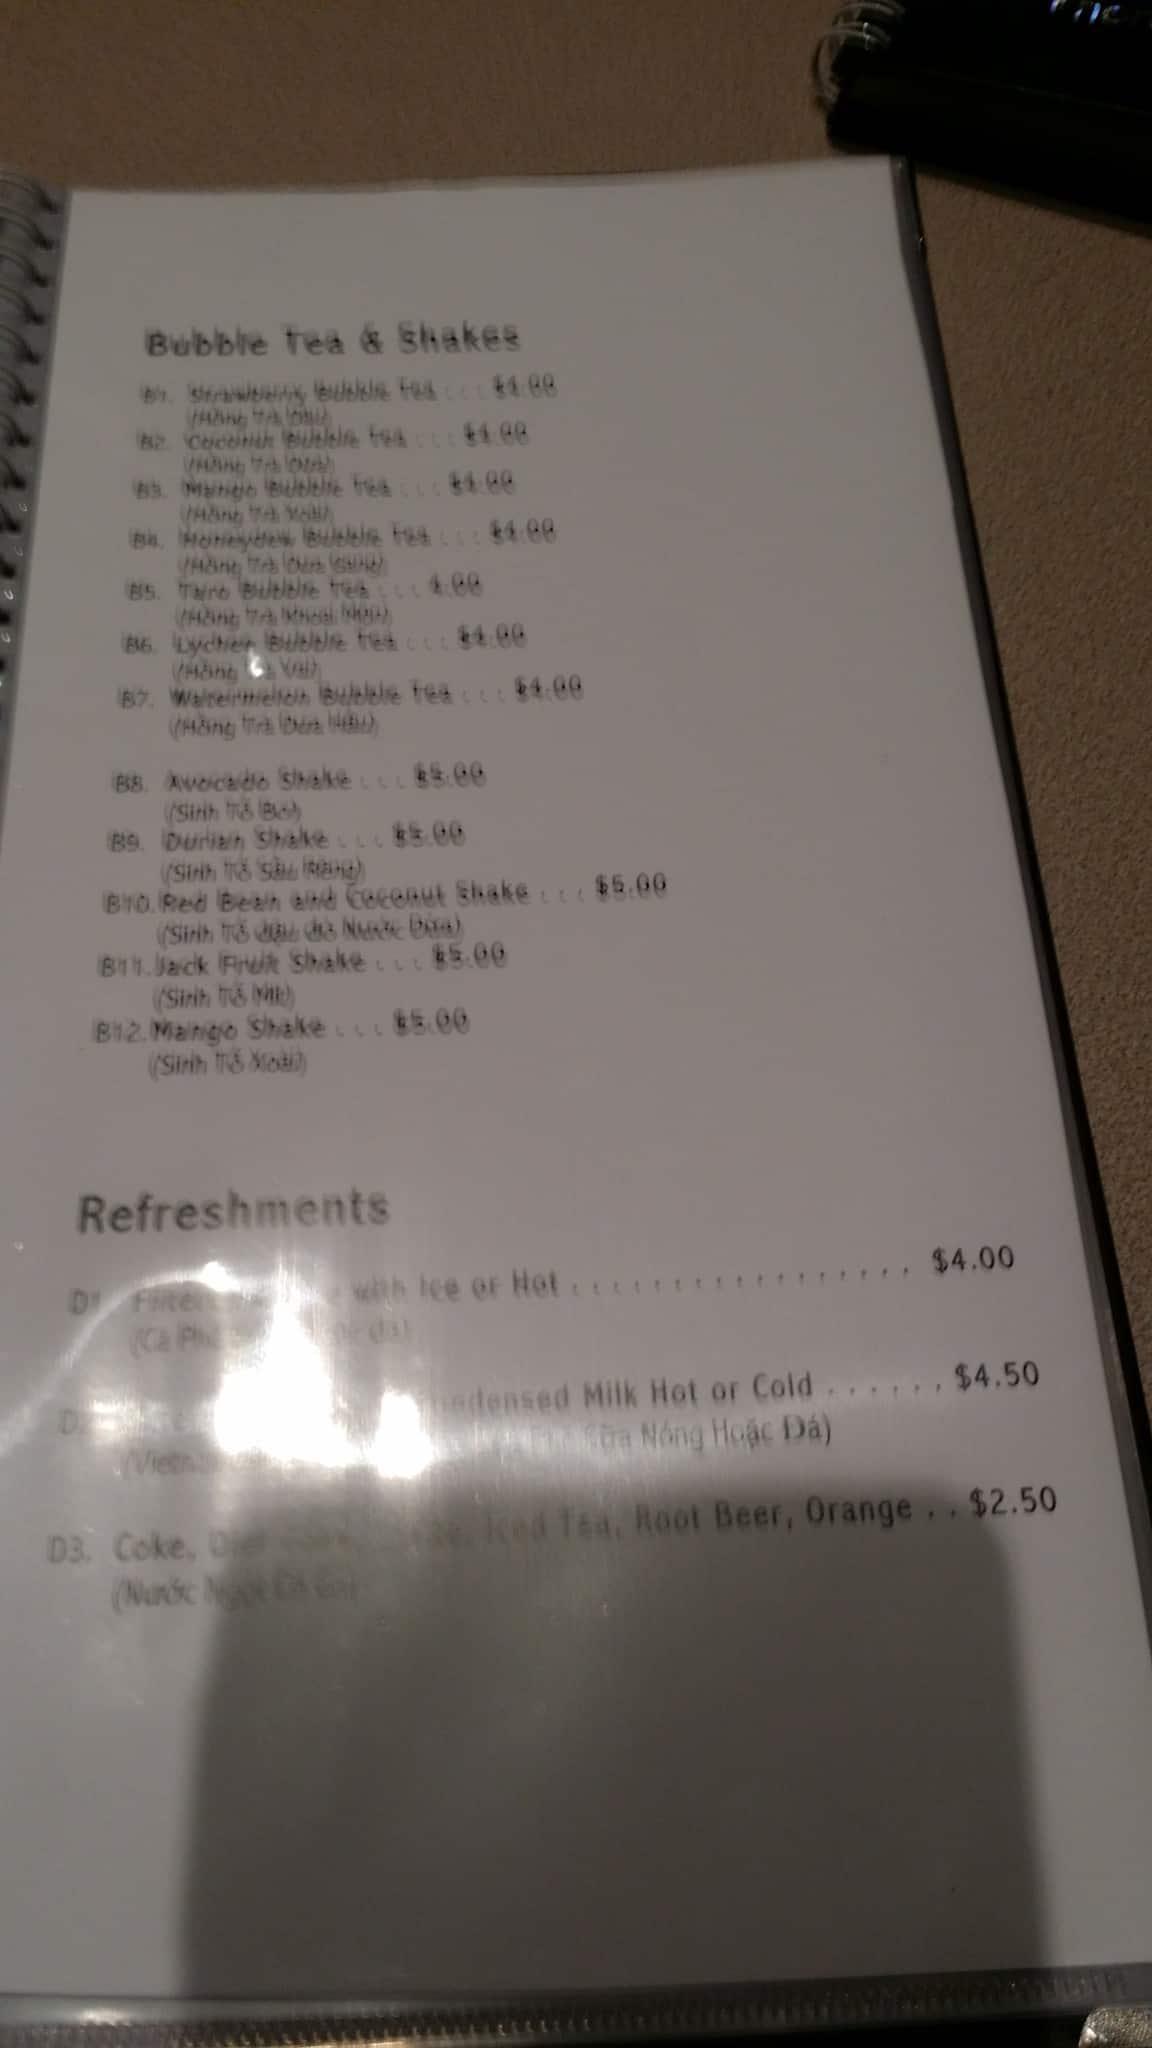 menu at pho 675 675 jefferson avenue restaurant prices